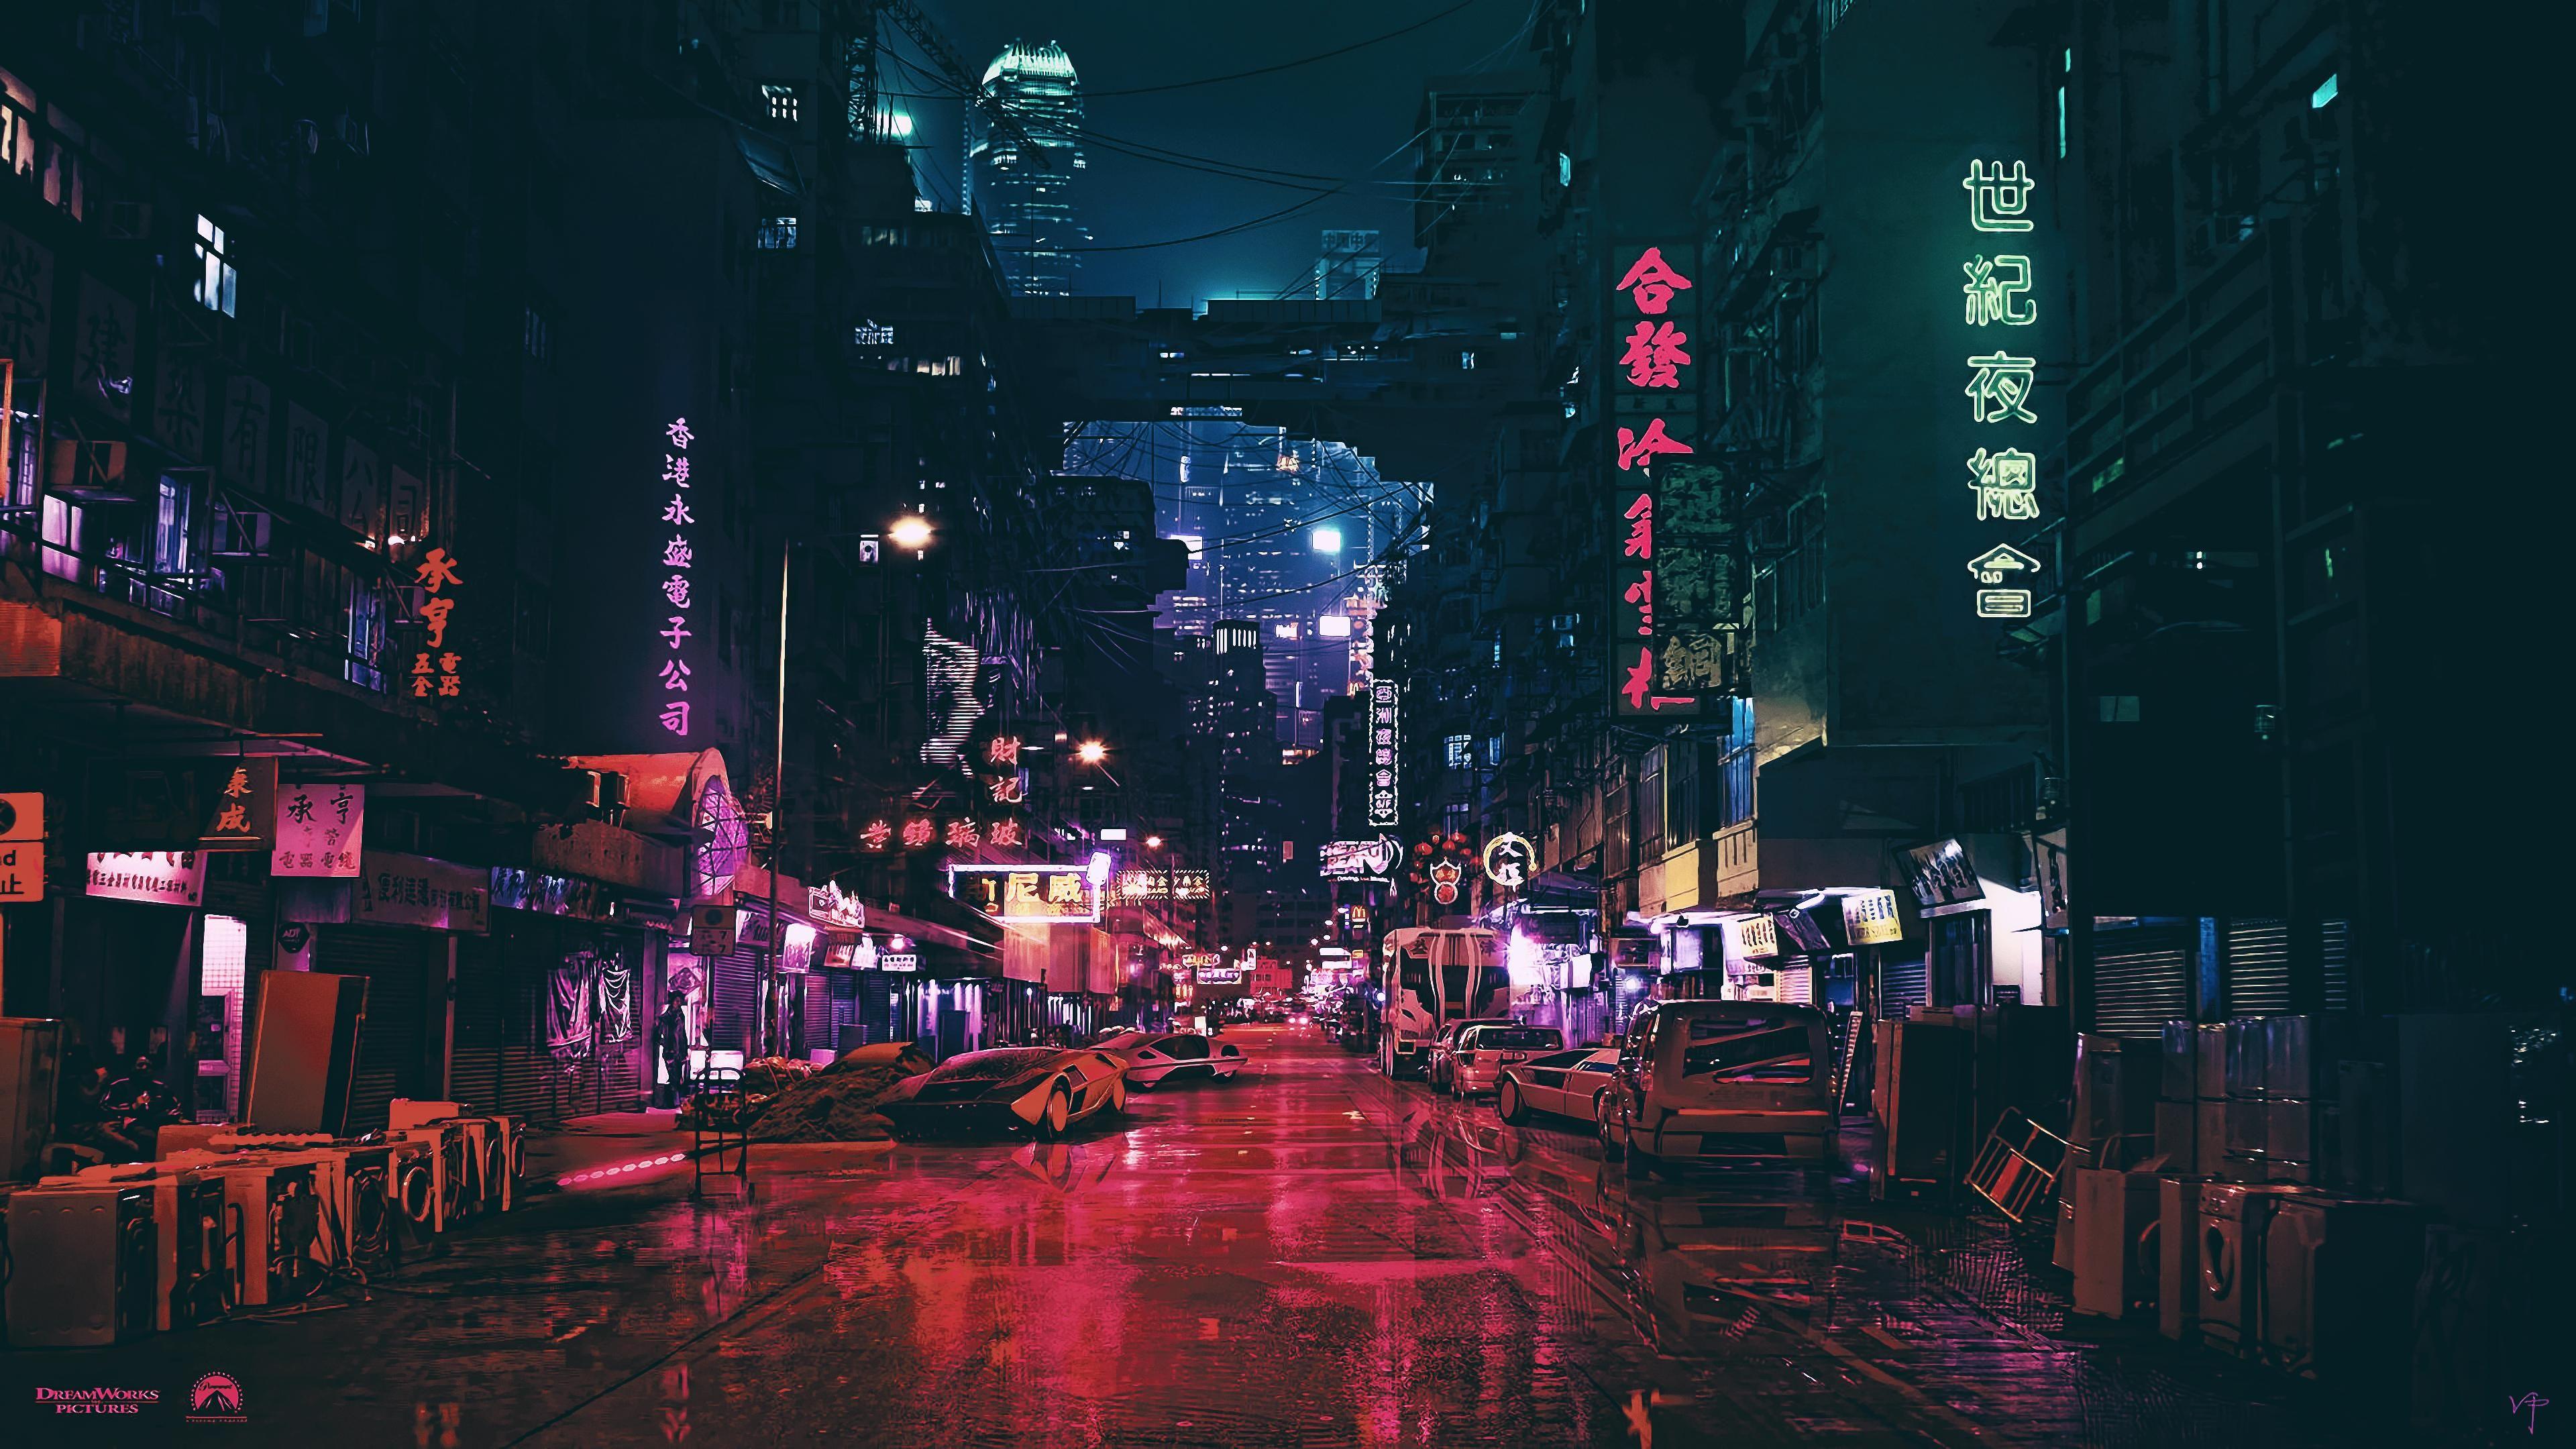 Futuristic Chinatown At Night 4k Wallpaper Kota Cyberpunk Wallpaper Desktop Wallpaper Anime